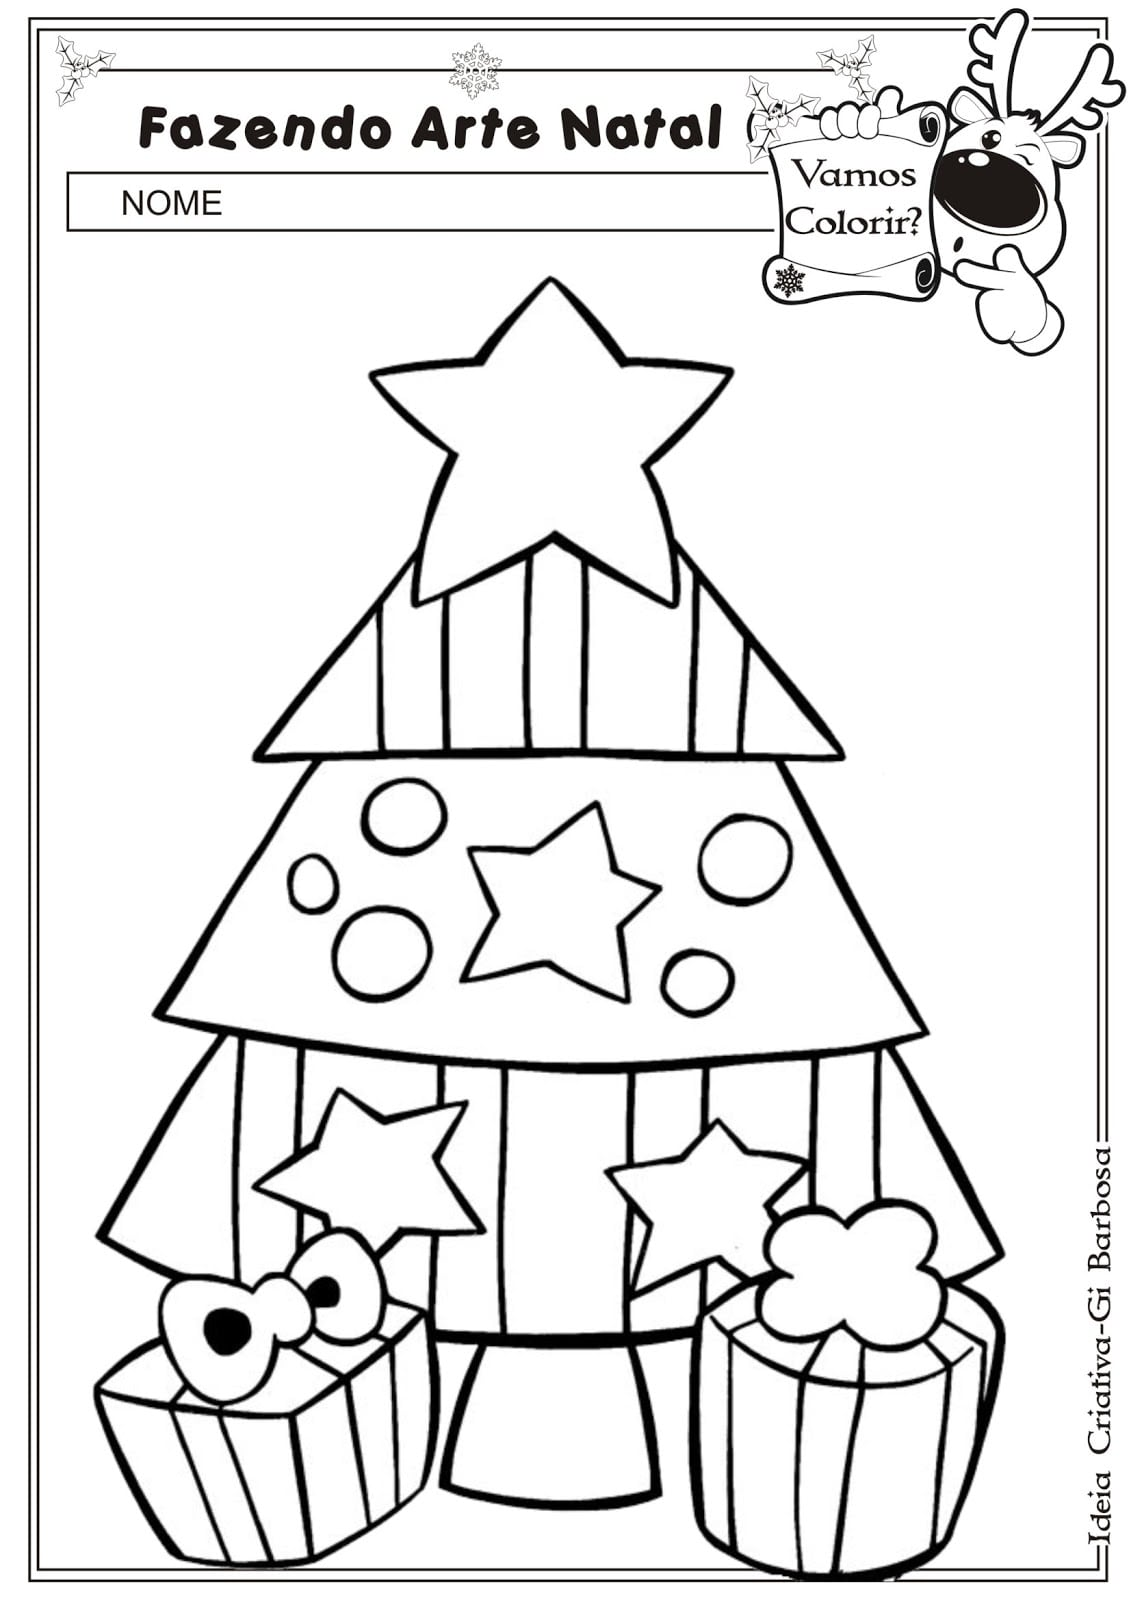 Cart Es De Natal Para Colorir E Imprimir – Pampekids Net